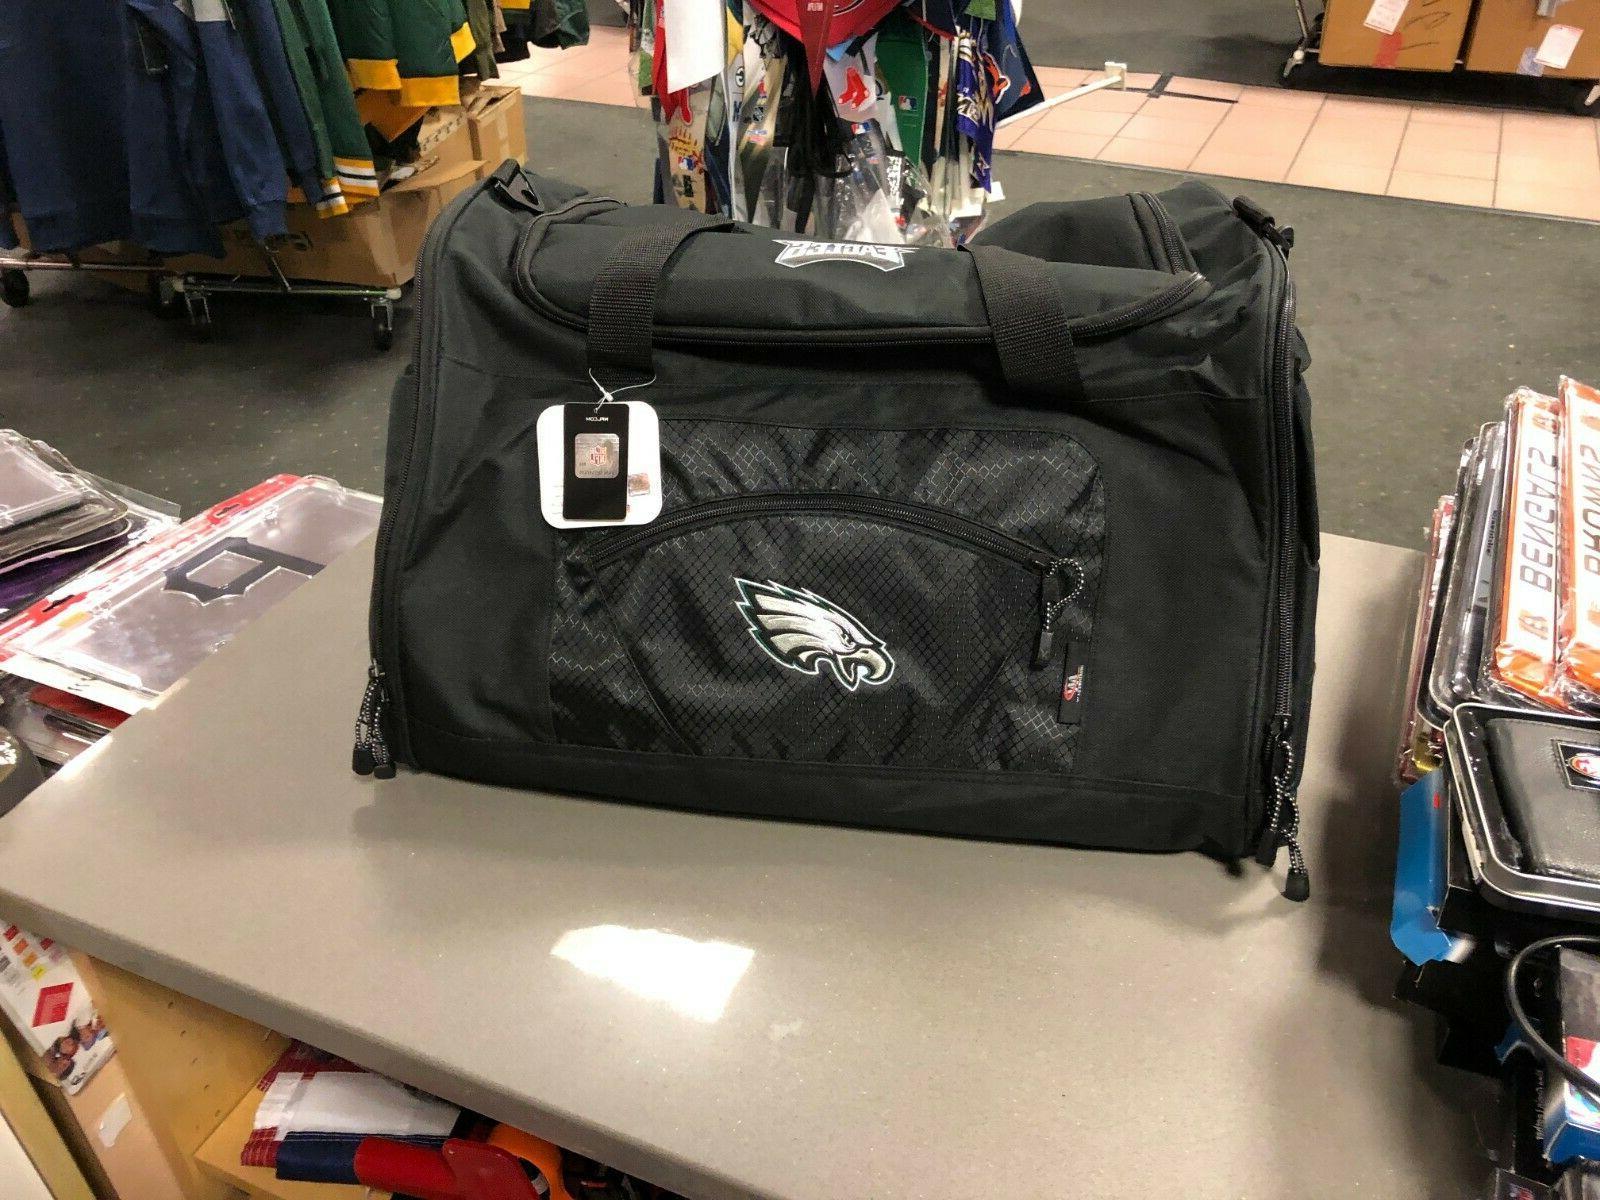 Philadelphia Eagles Gym/Duffle Bag Workout NFL black